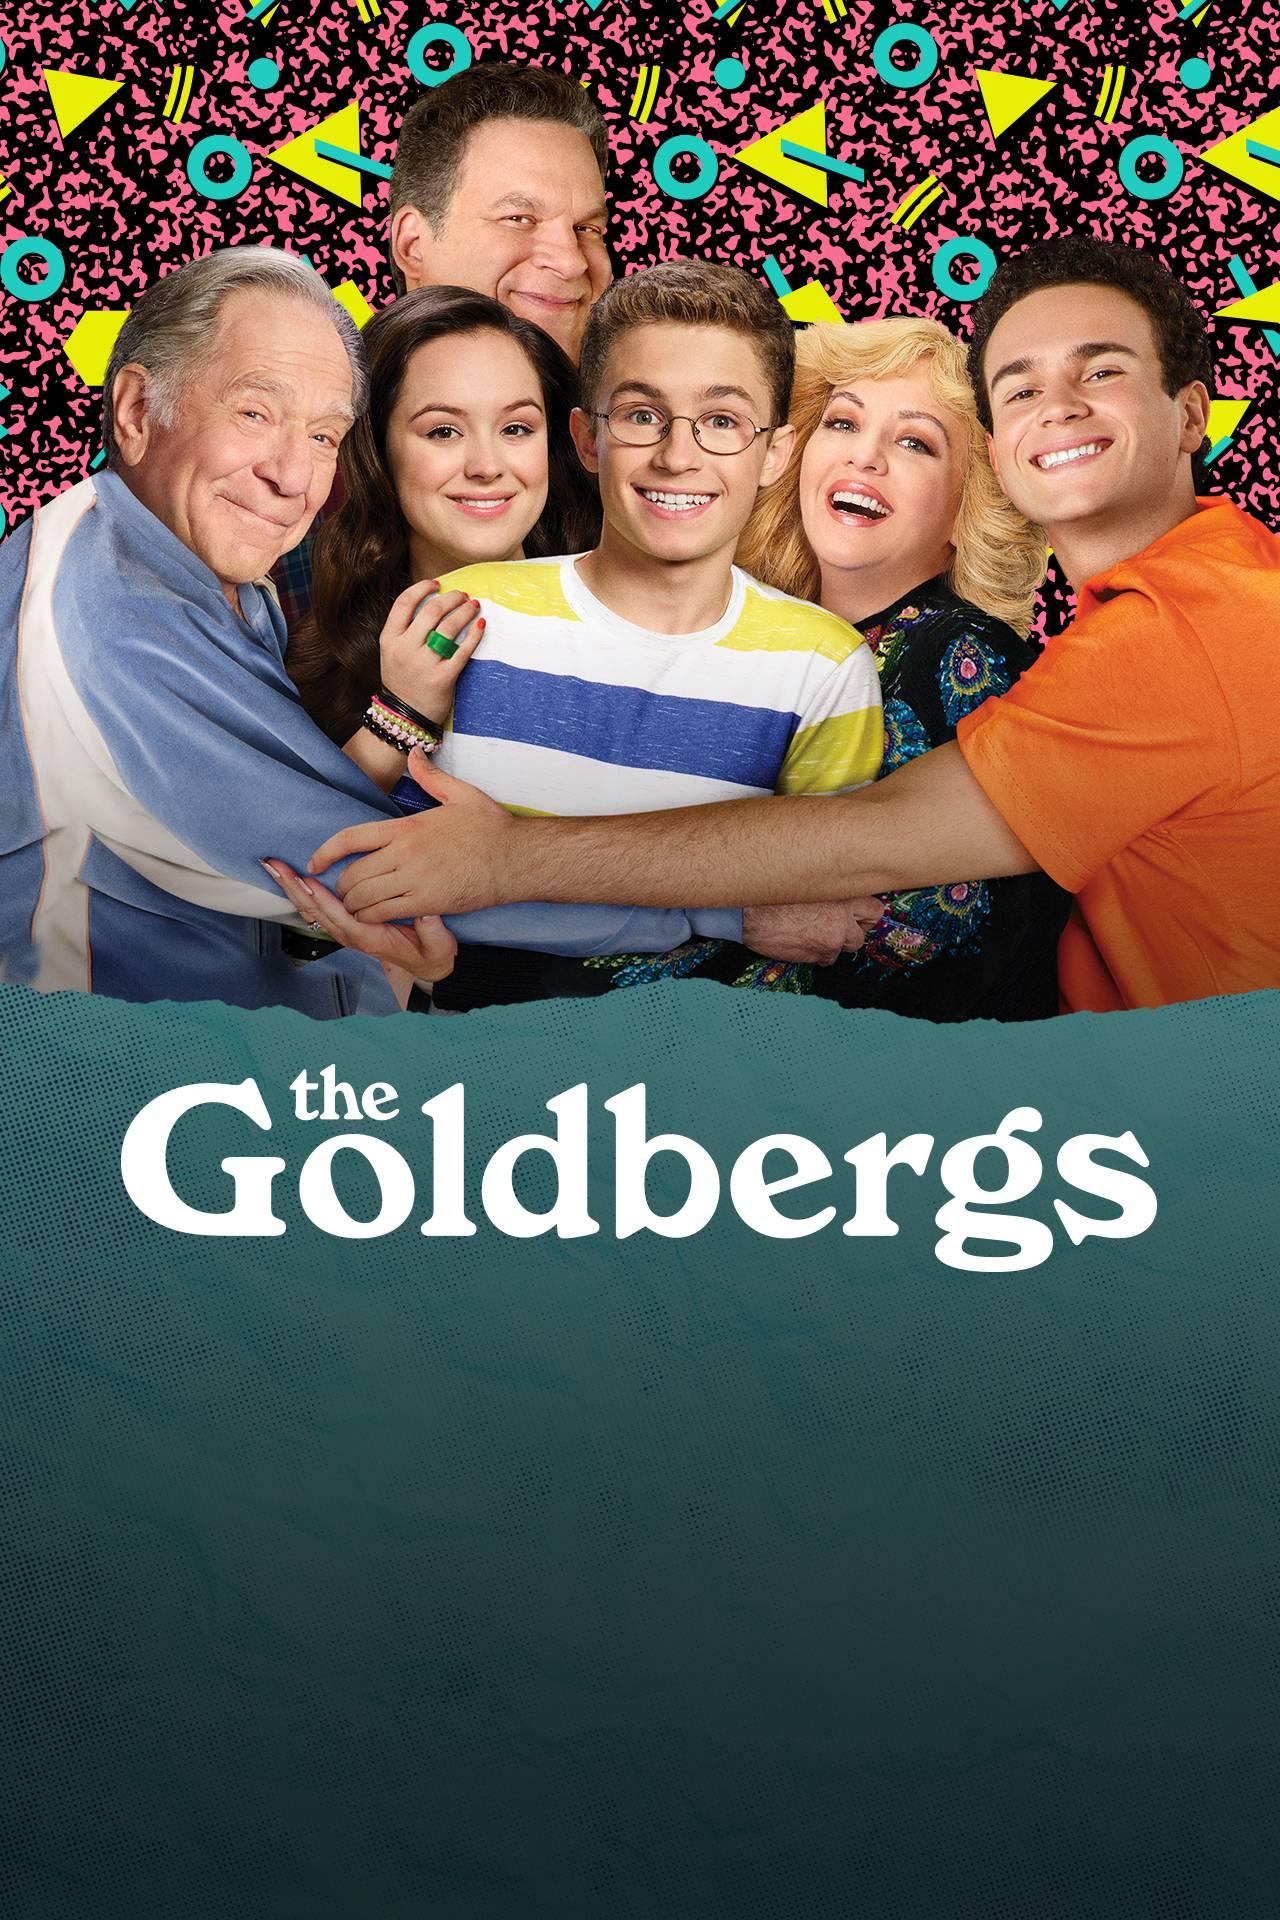 The Goldbergs - Season 5 - TV Series | TV Land